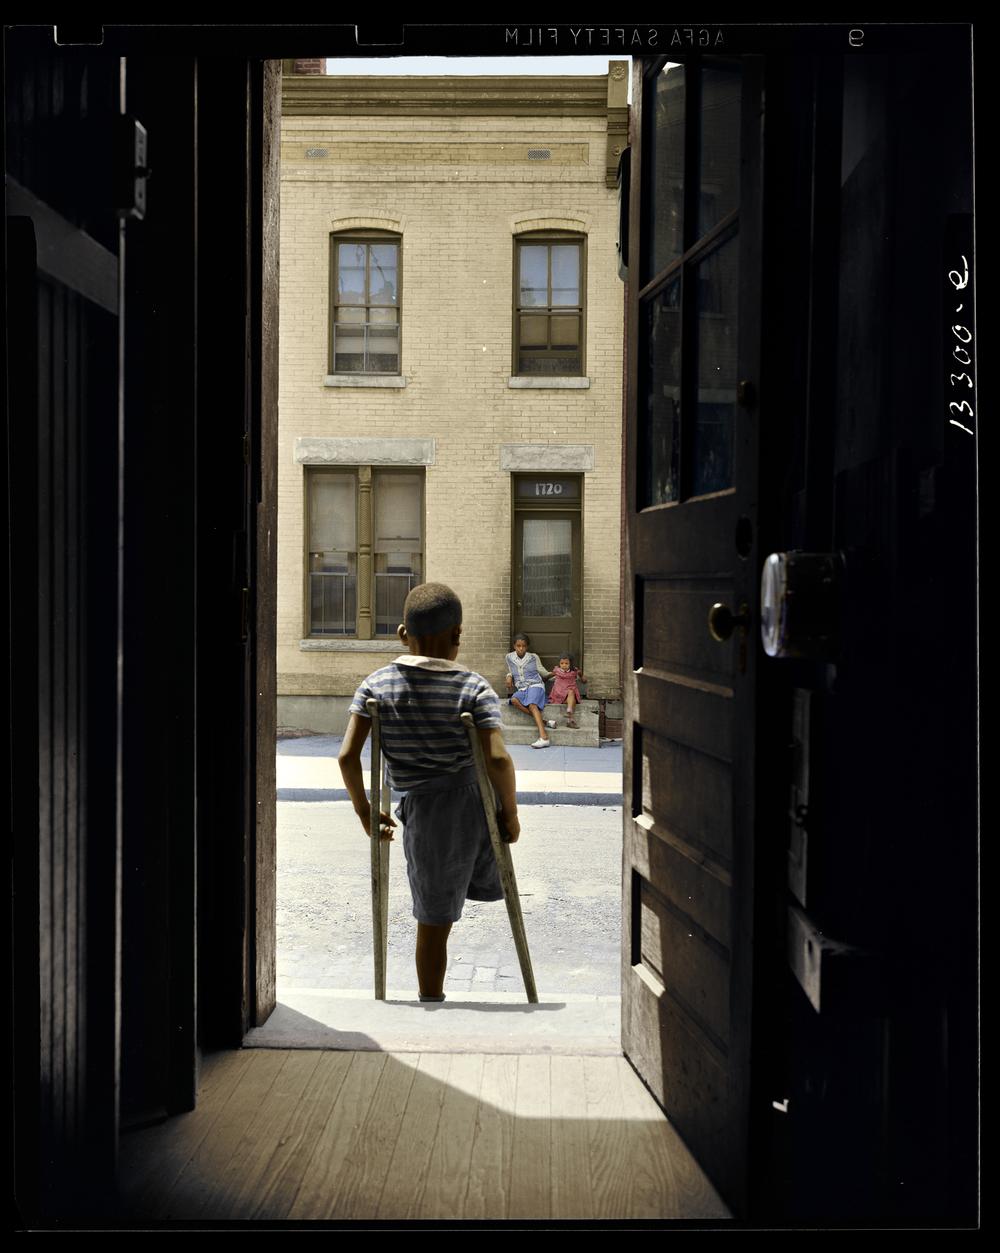 Young Boy in Door Frame, Washington DC, 1942